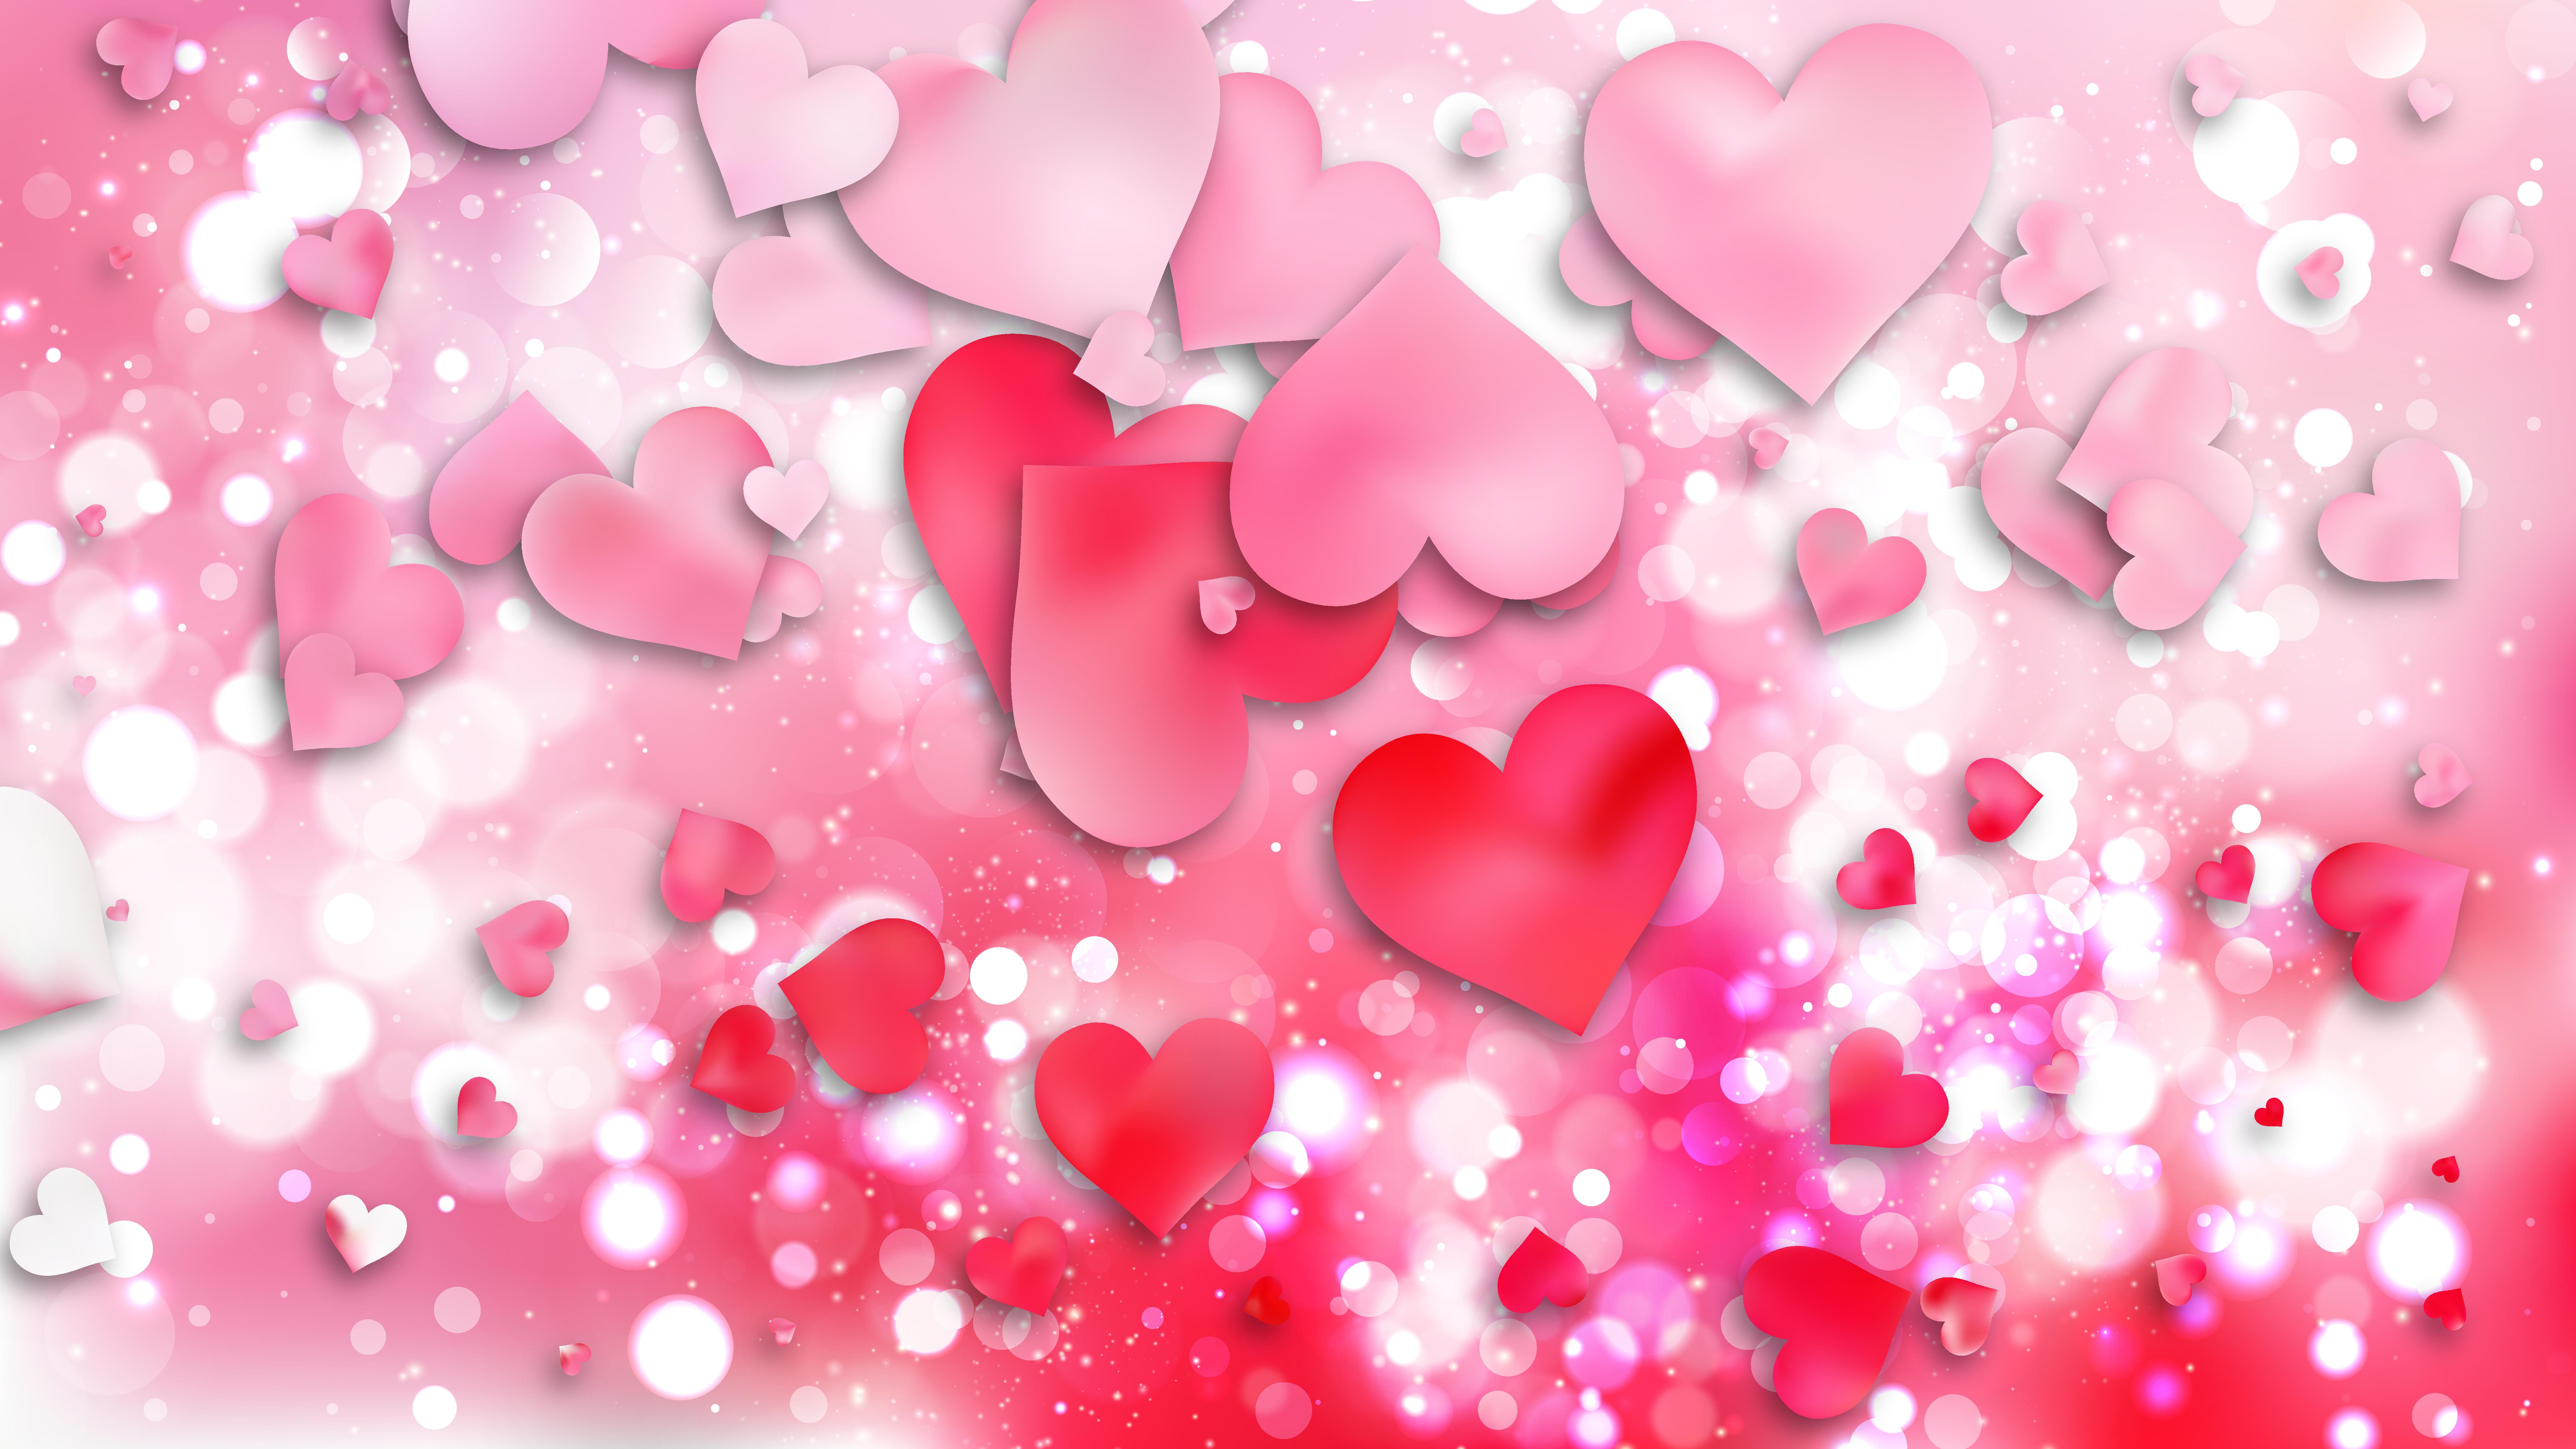 Download 47 Background Pink Love Hd Paling Keren